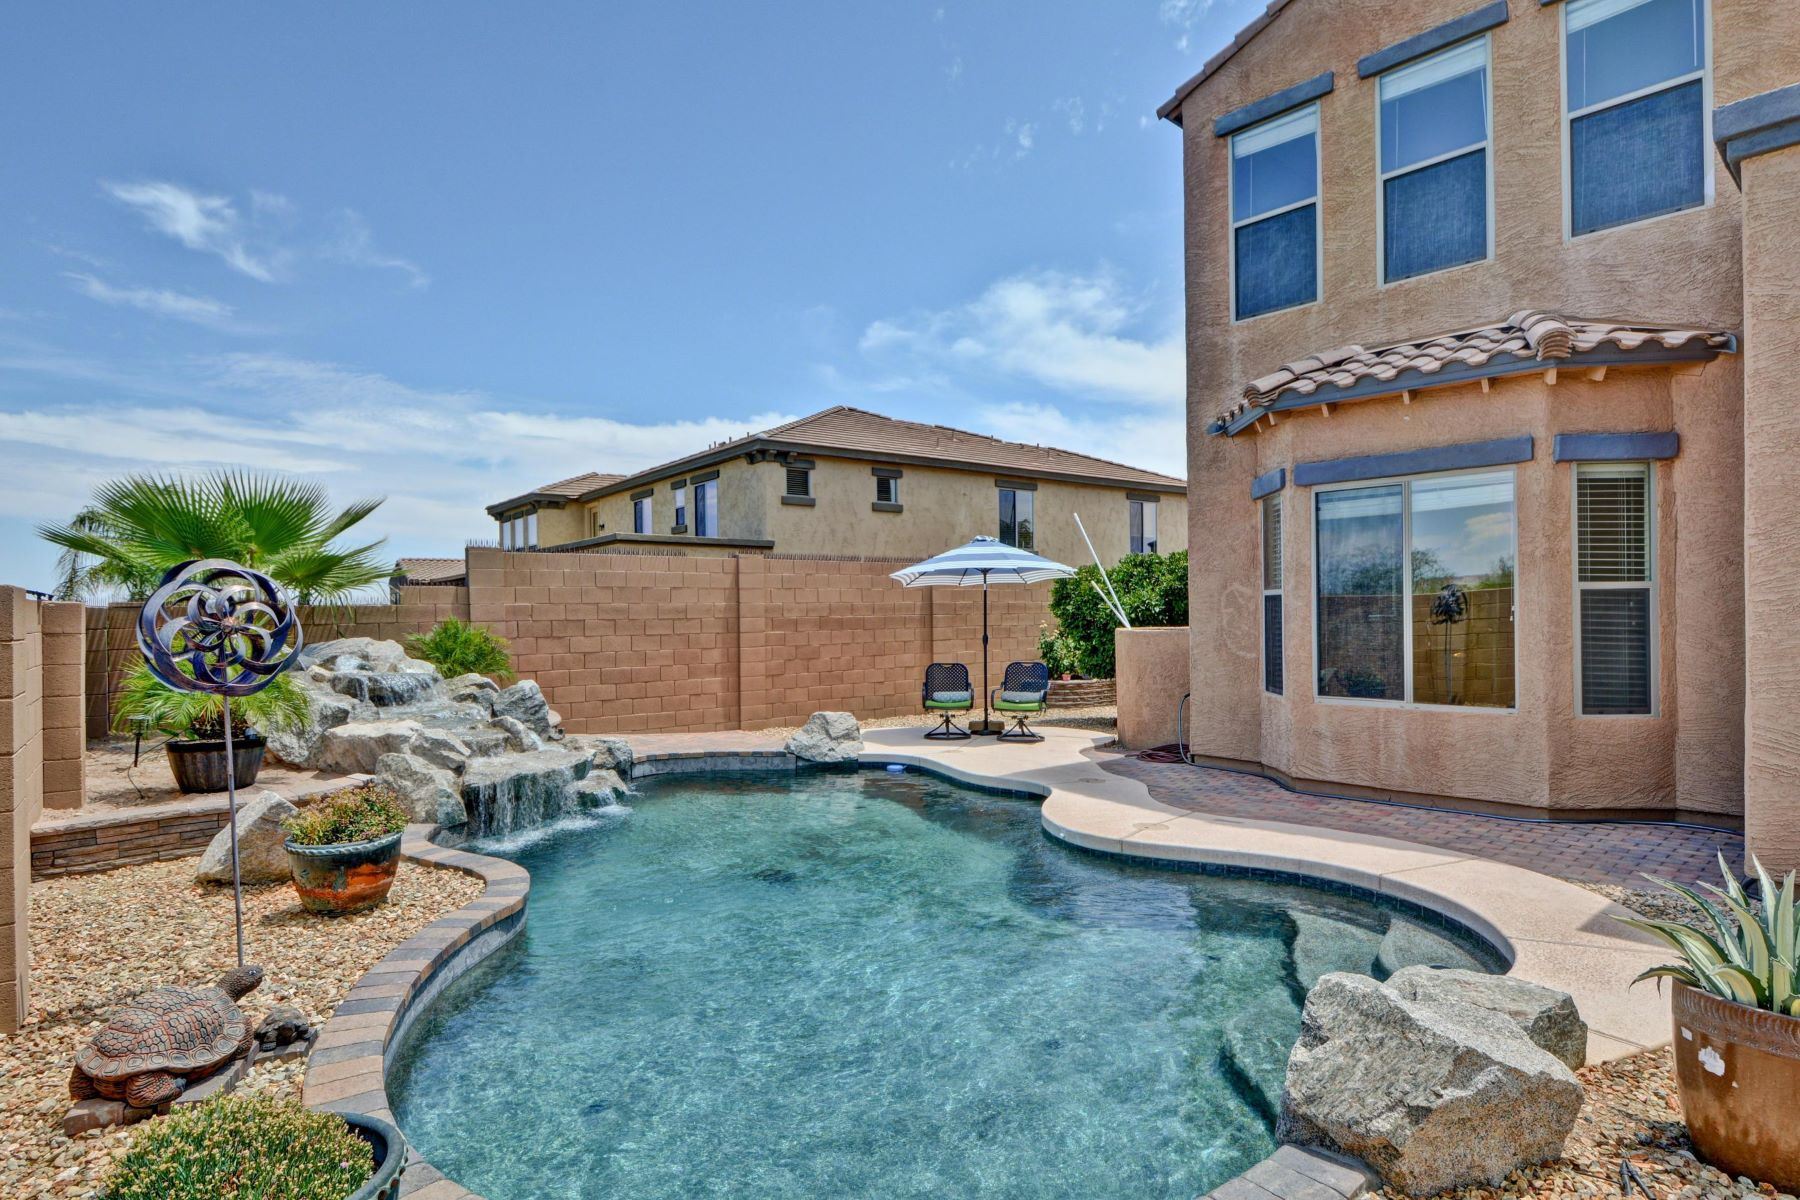 Single Family Homes for Sale at Crossriver 12022 W MONTE LINDO LN Sun City, Arizona 85373 United States